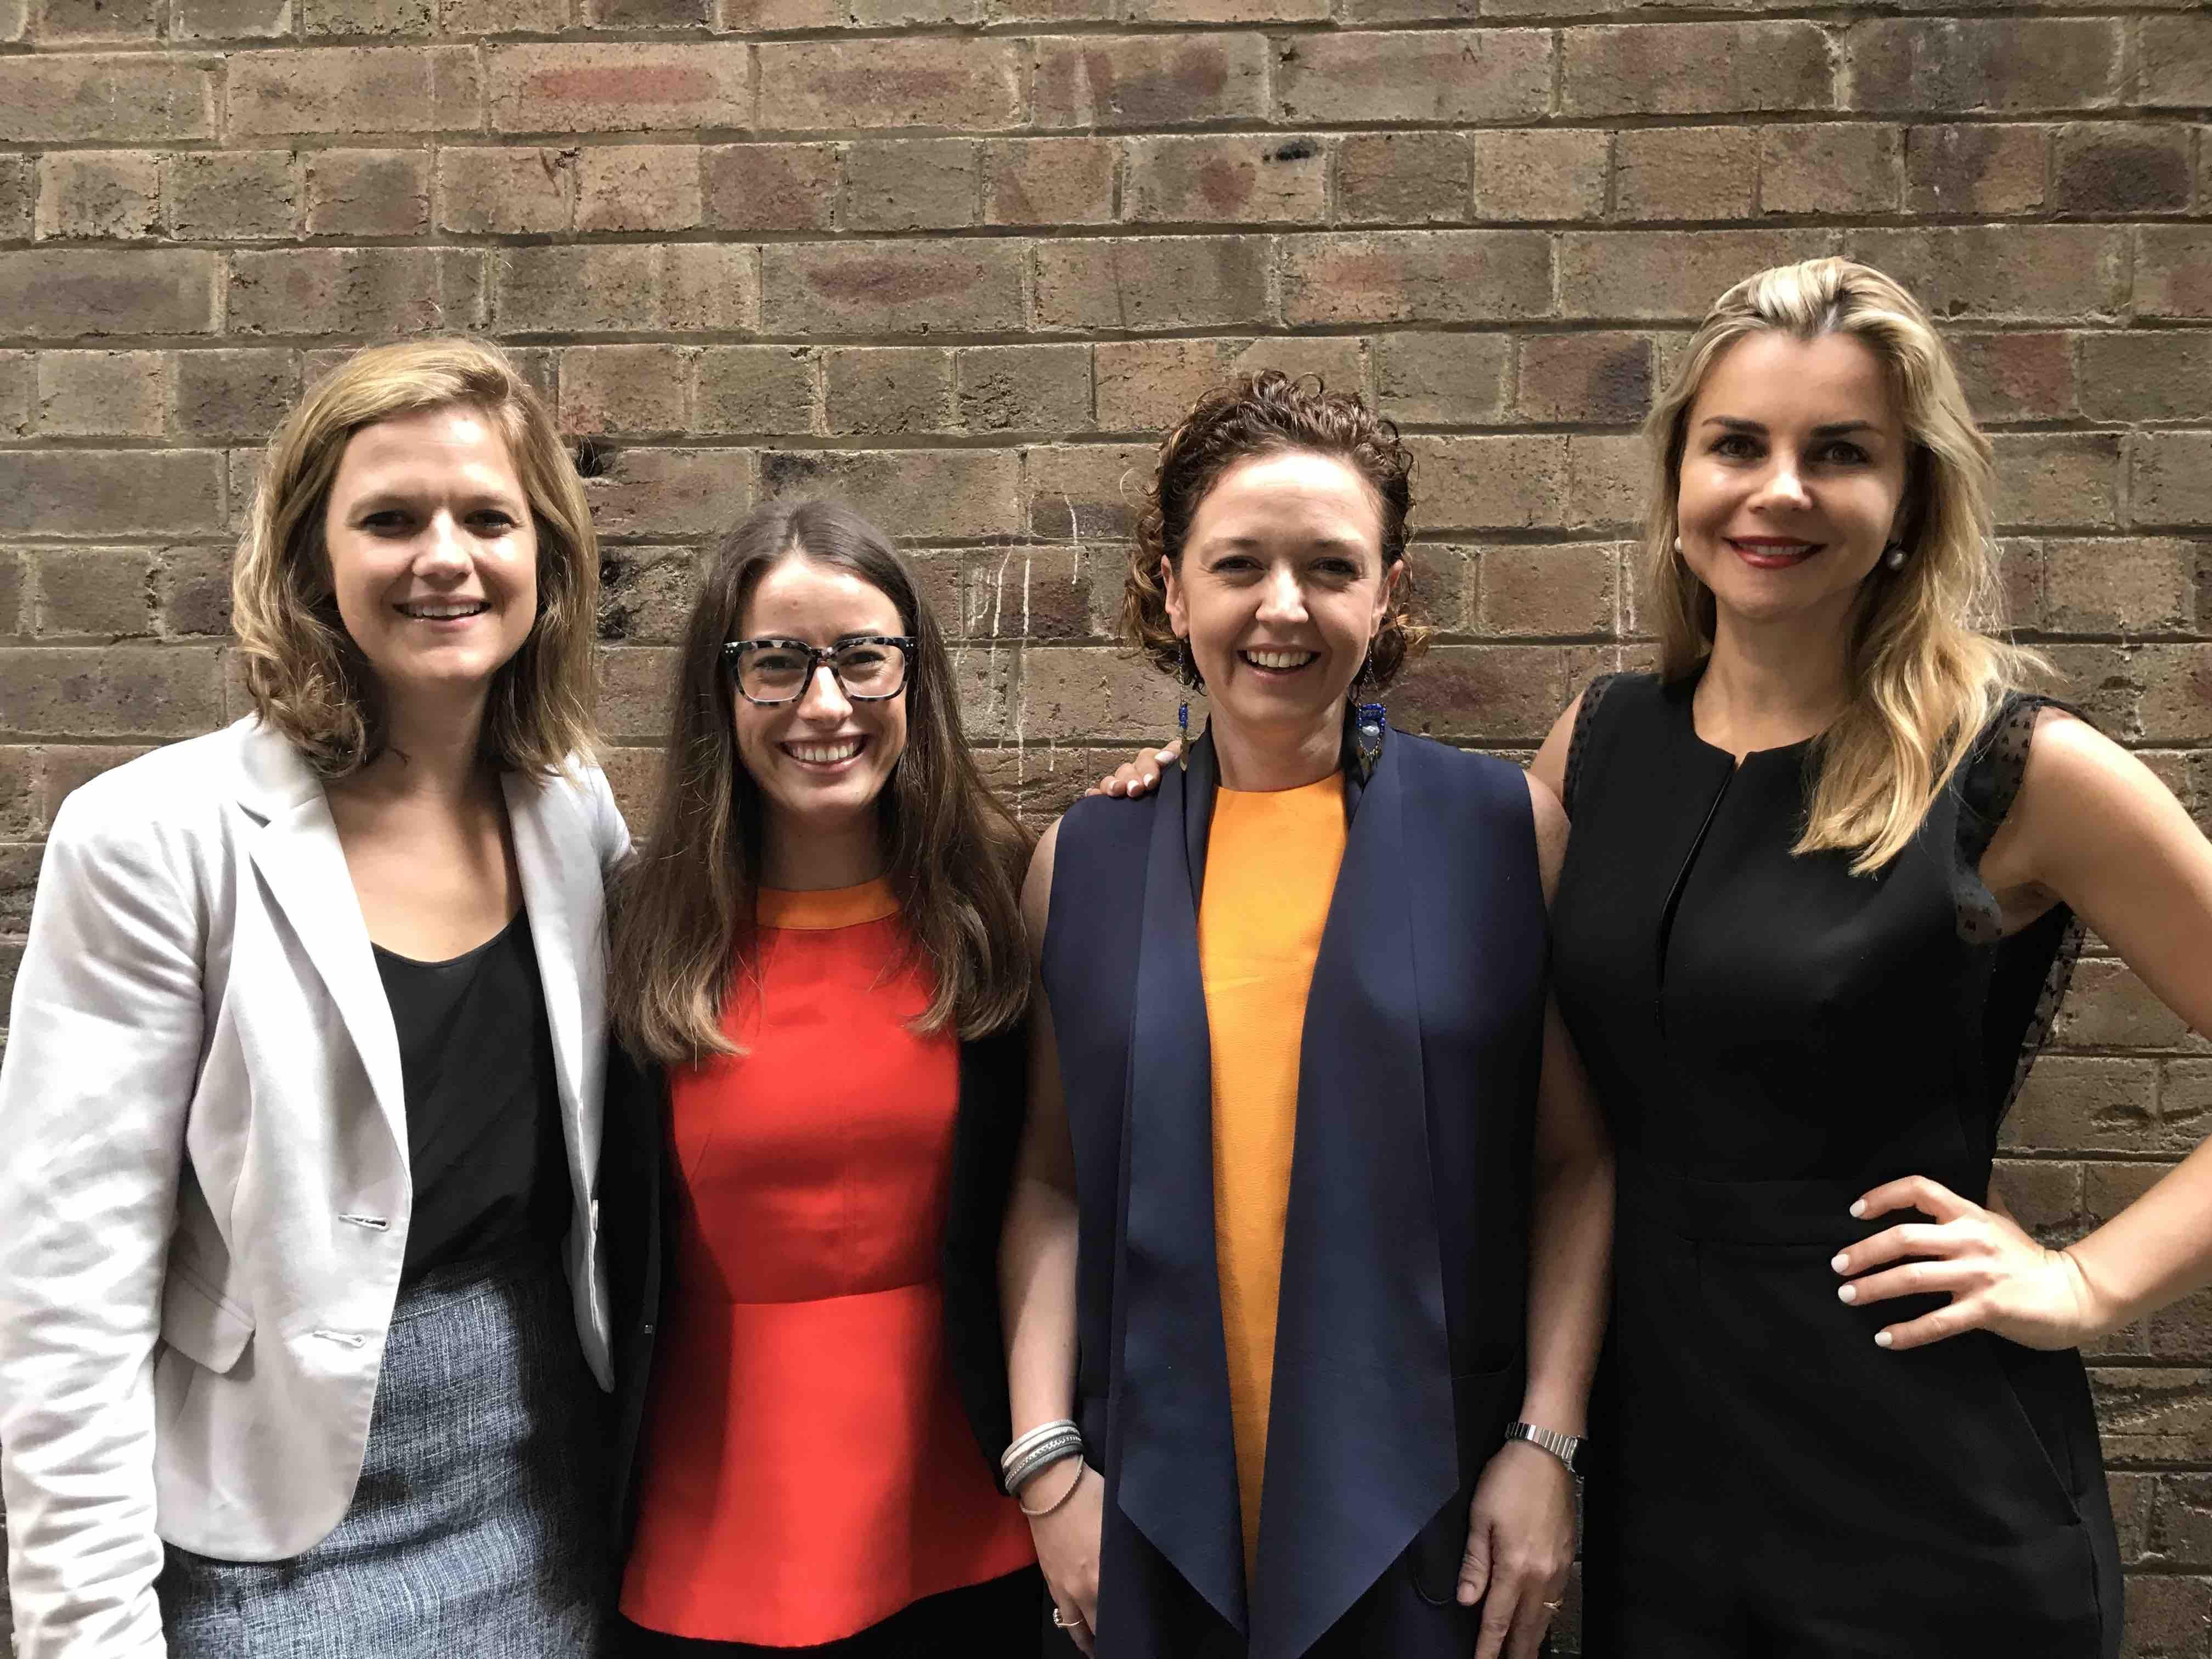 Alexis Carroll, Sarah Bullen, Aideen McDonald and Agata Kenna (DEC PR)